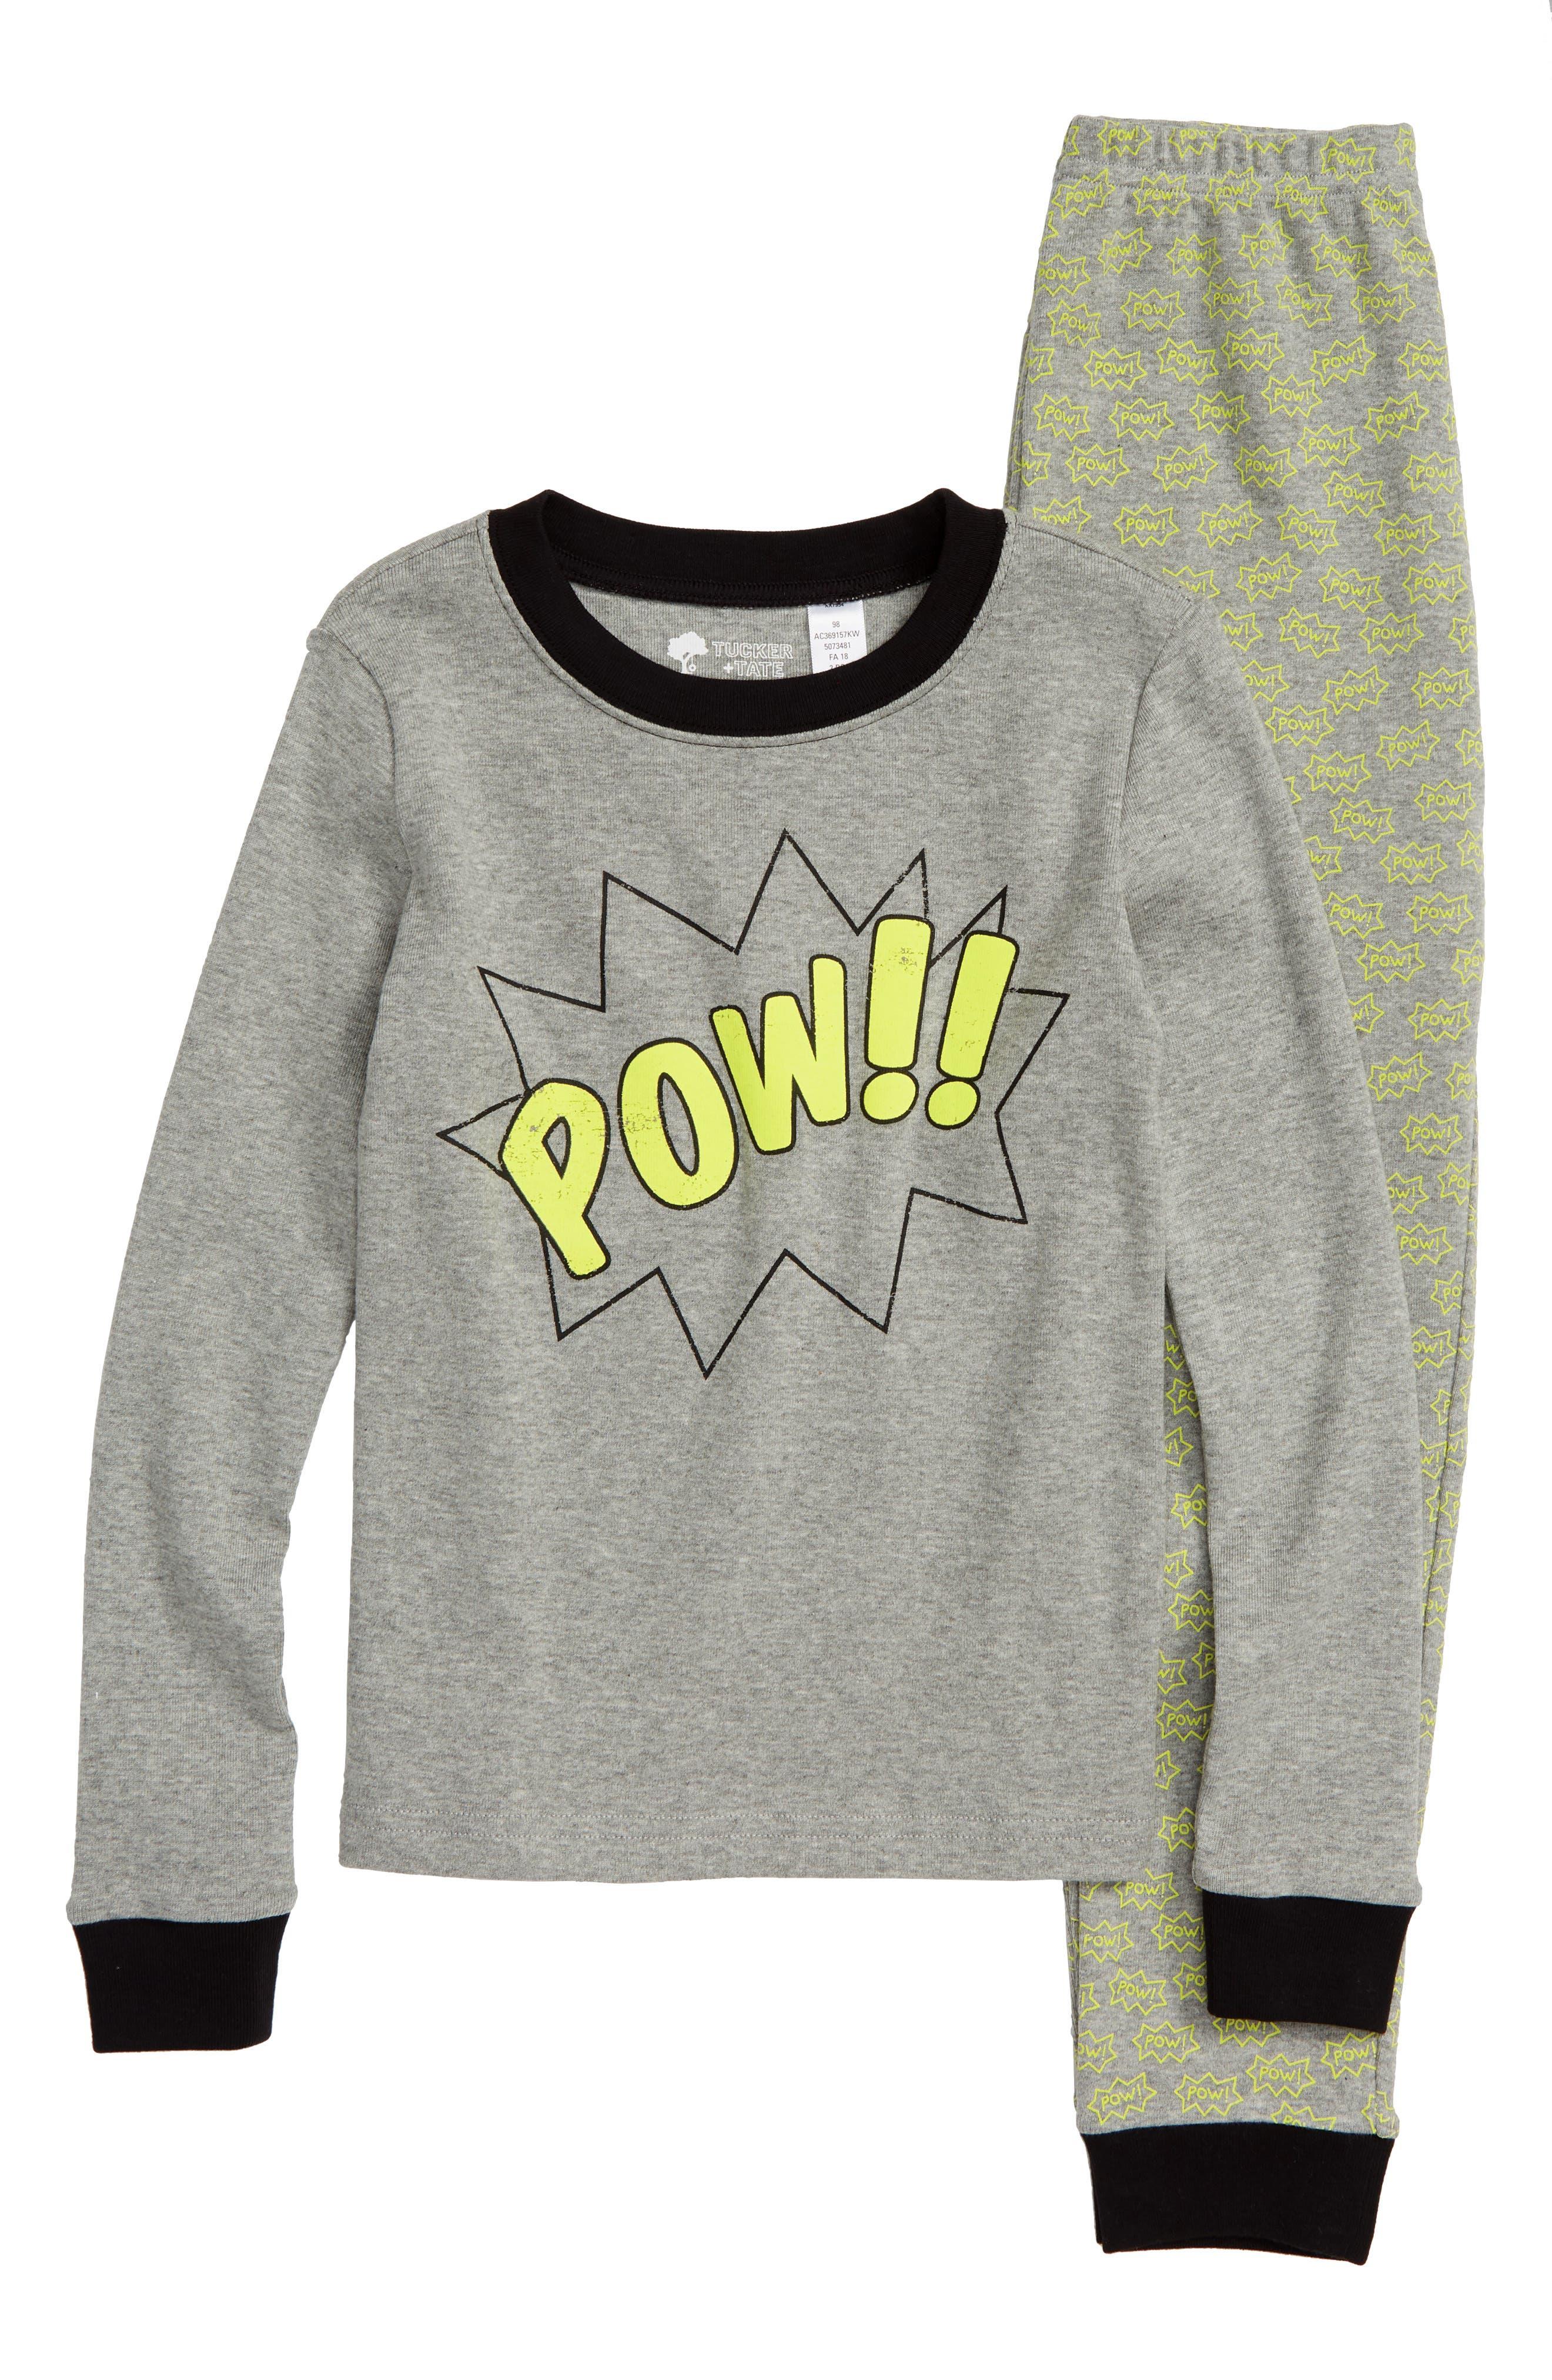 Glow in the Dark Two-Piece Fitted Pajamas,                         Main,                         color, GREY MEDIUM HEATHER SUPERHERO